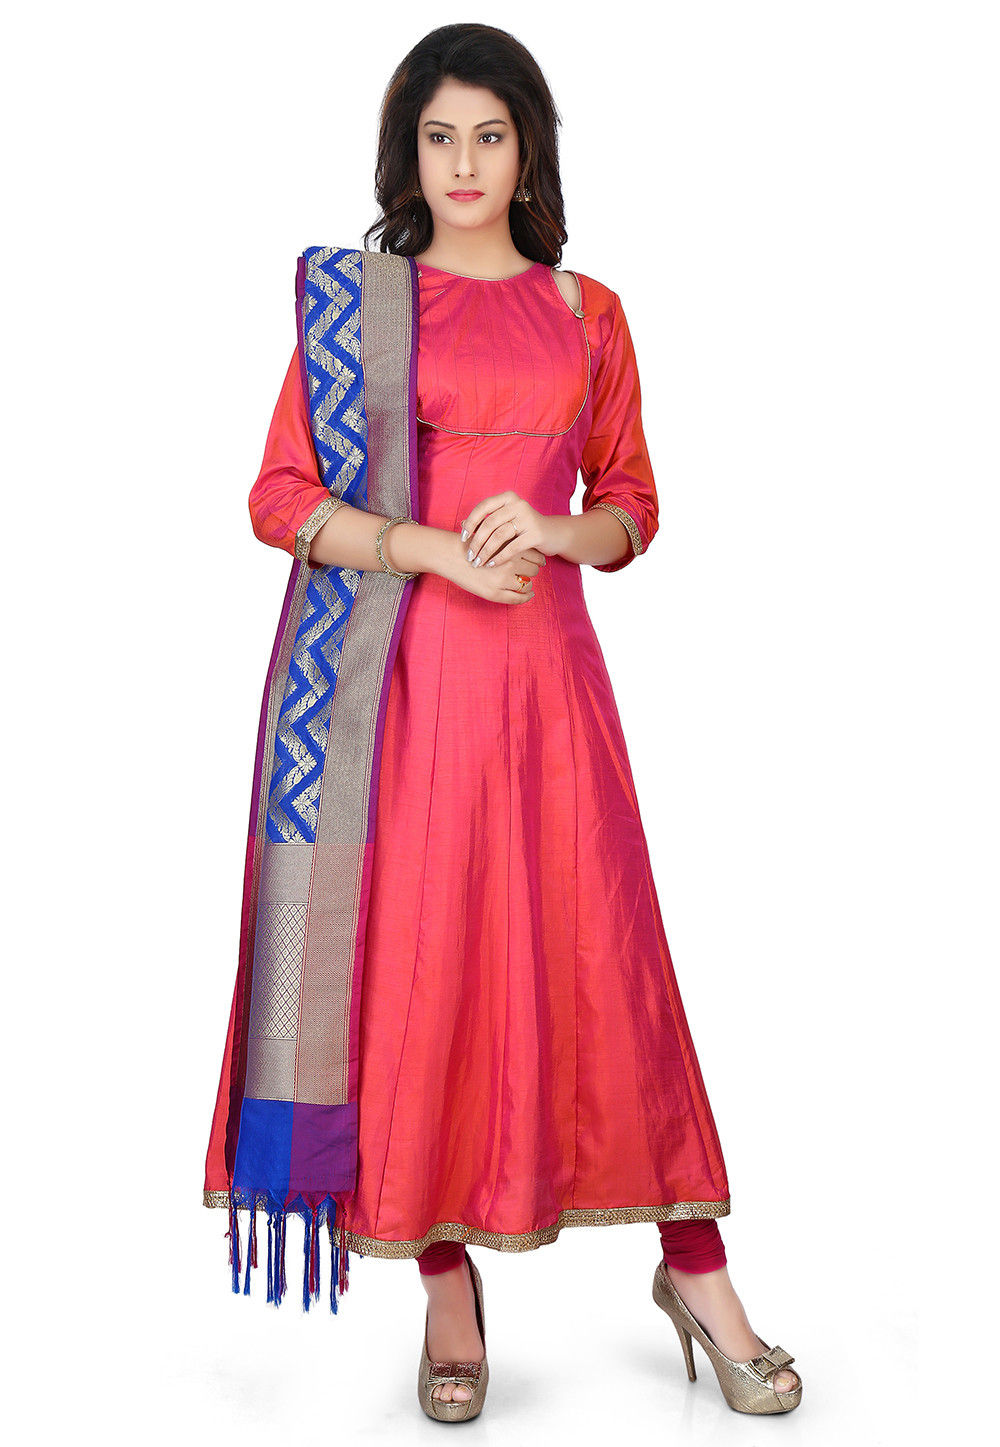 Banarasi Silk Anarkali Suit in Coral